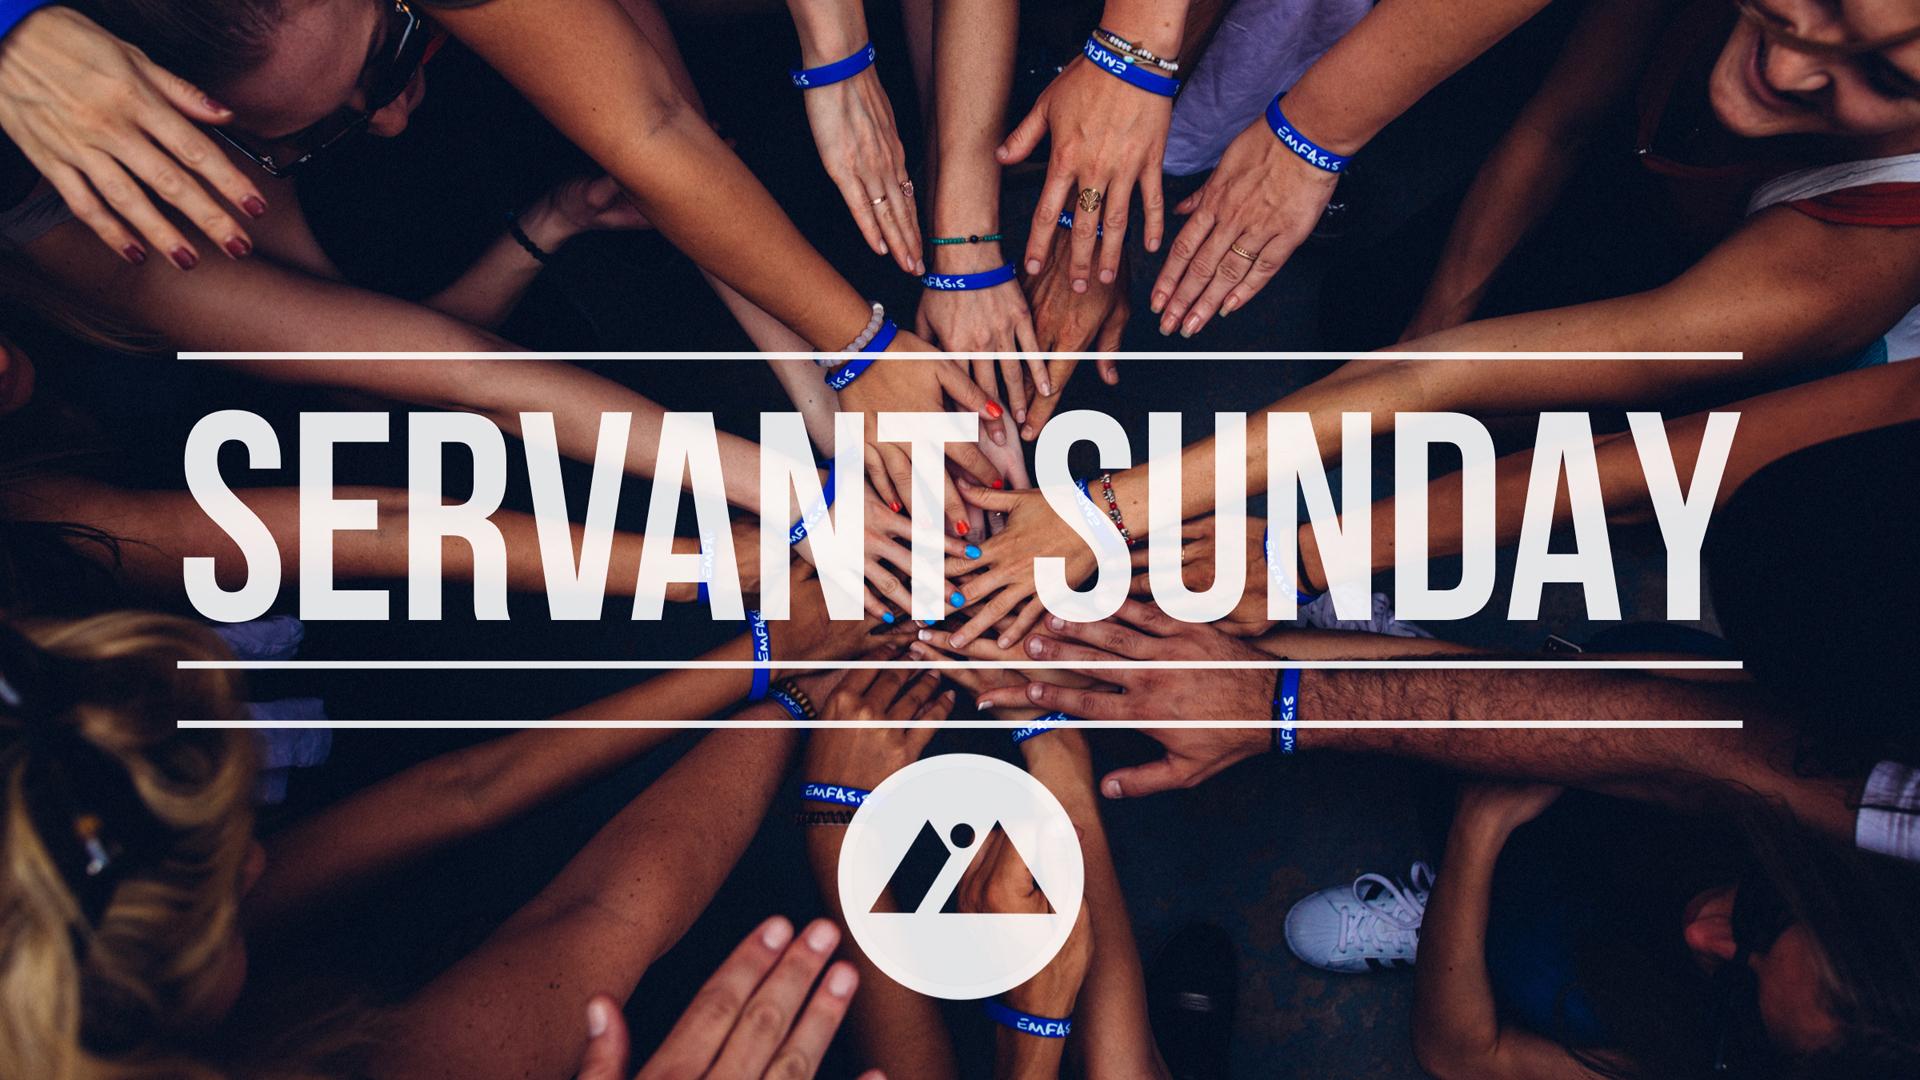 Servant Sunday.jpg